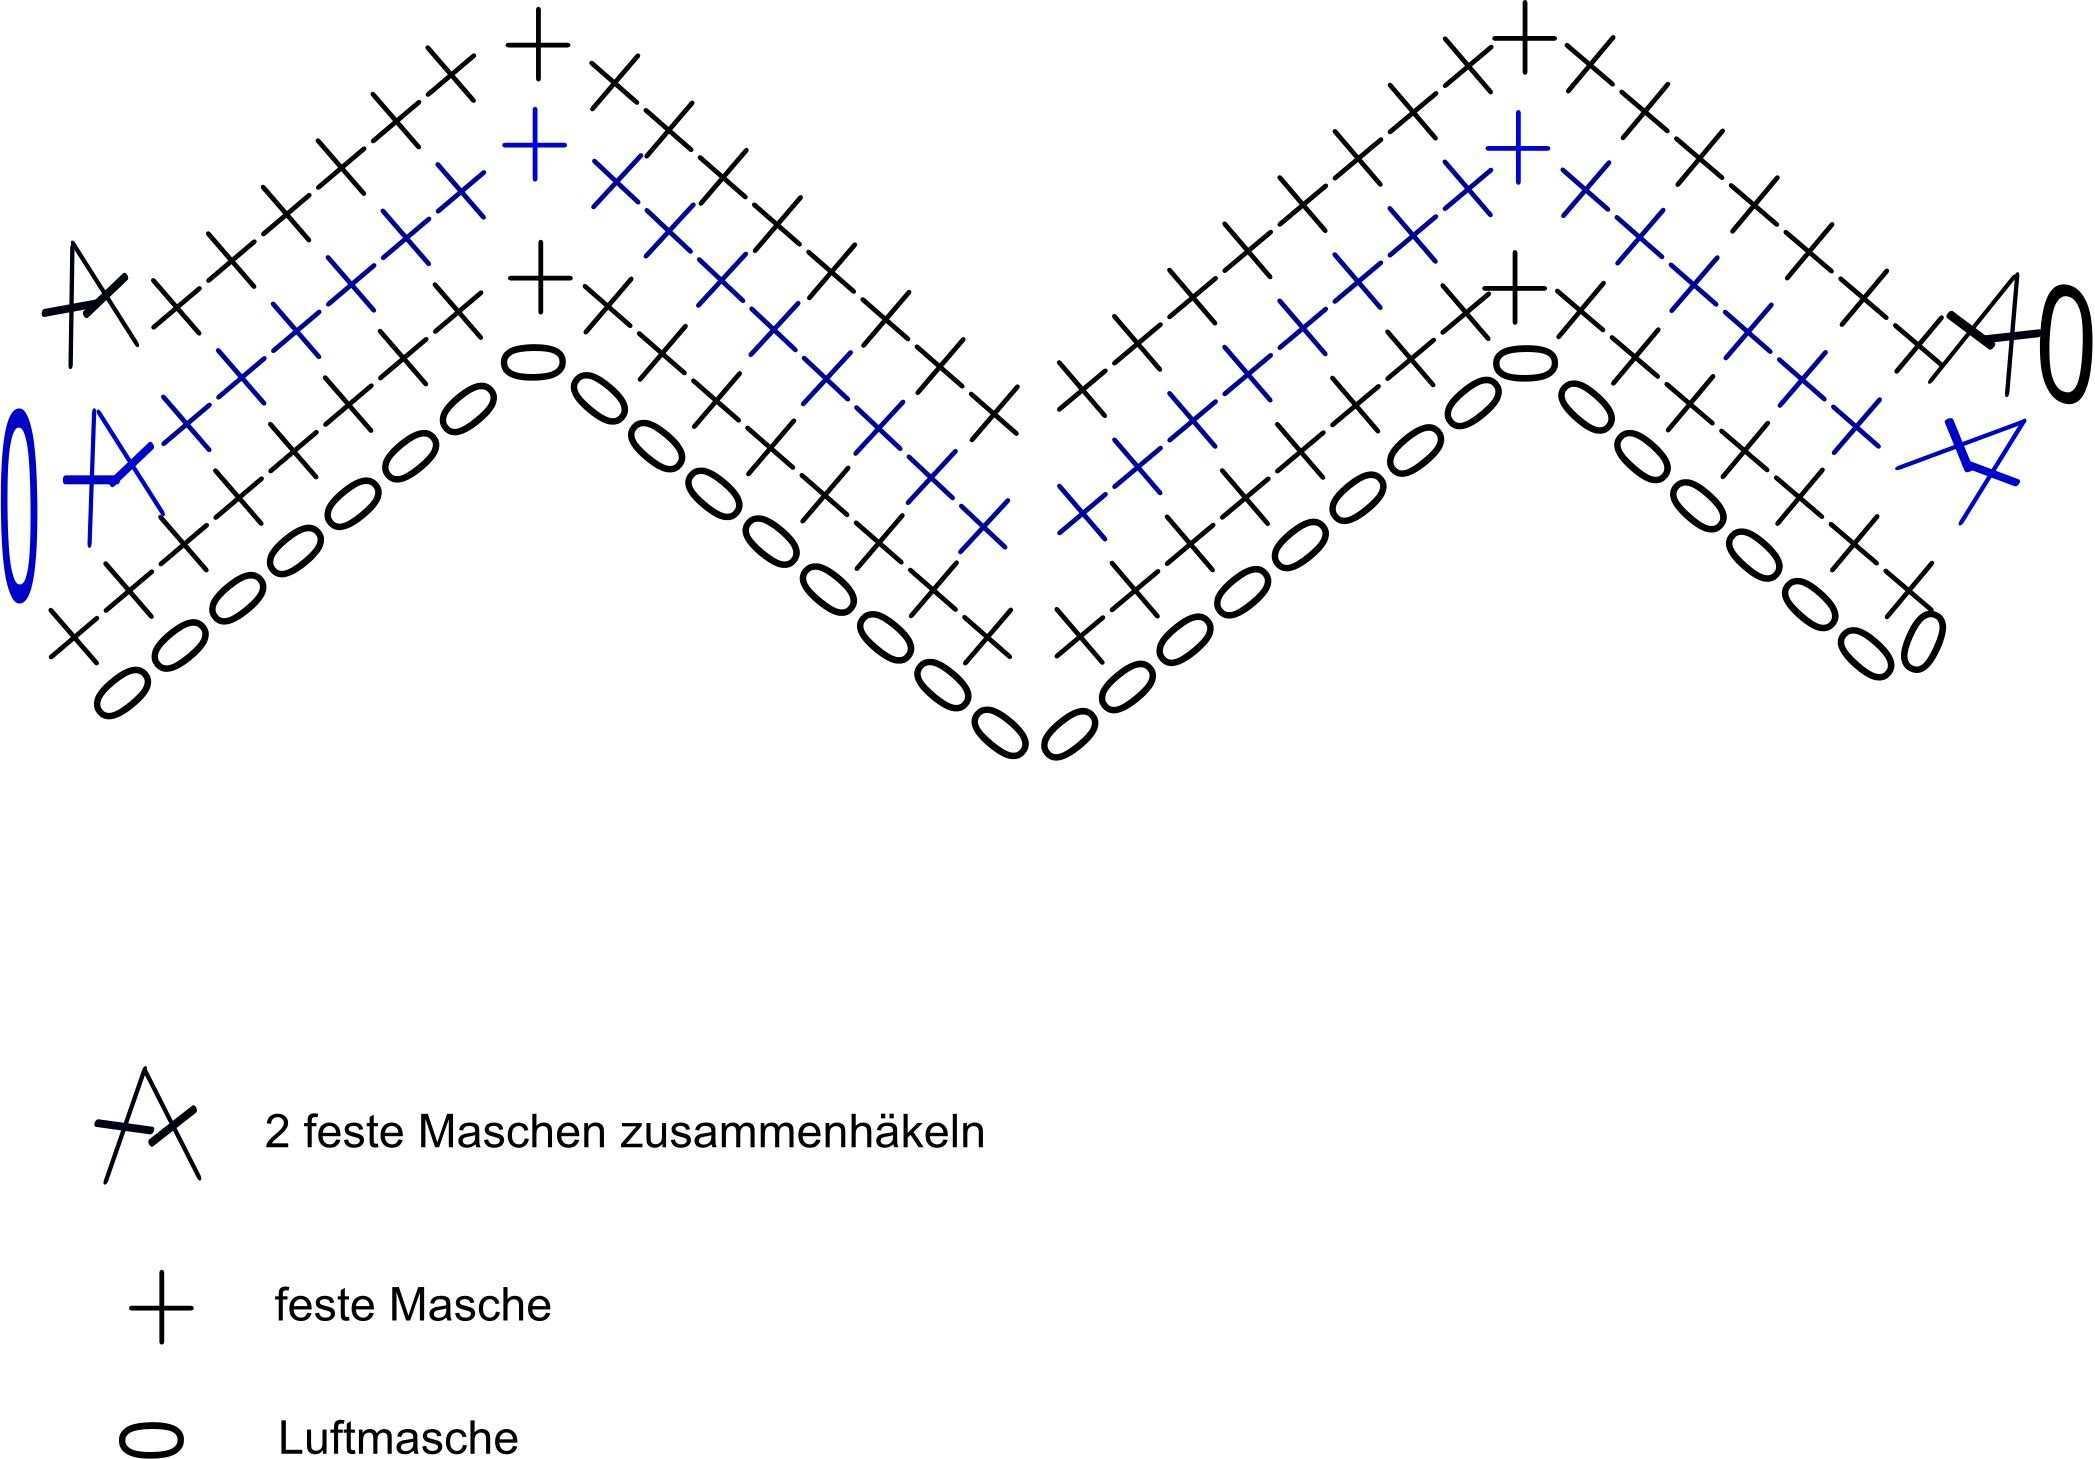 Tutorial Einfaches Zick Zack Muster Hakeln Decke Hakeln Muster Hakeln Muster Decke Hakeln Anleitung